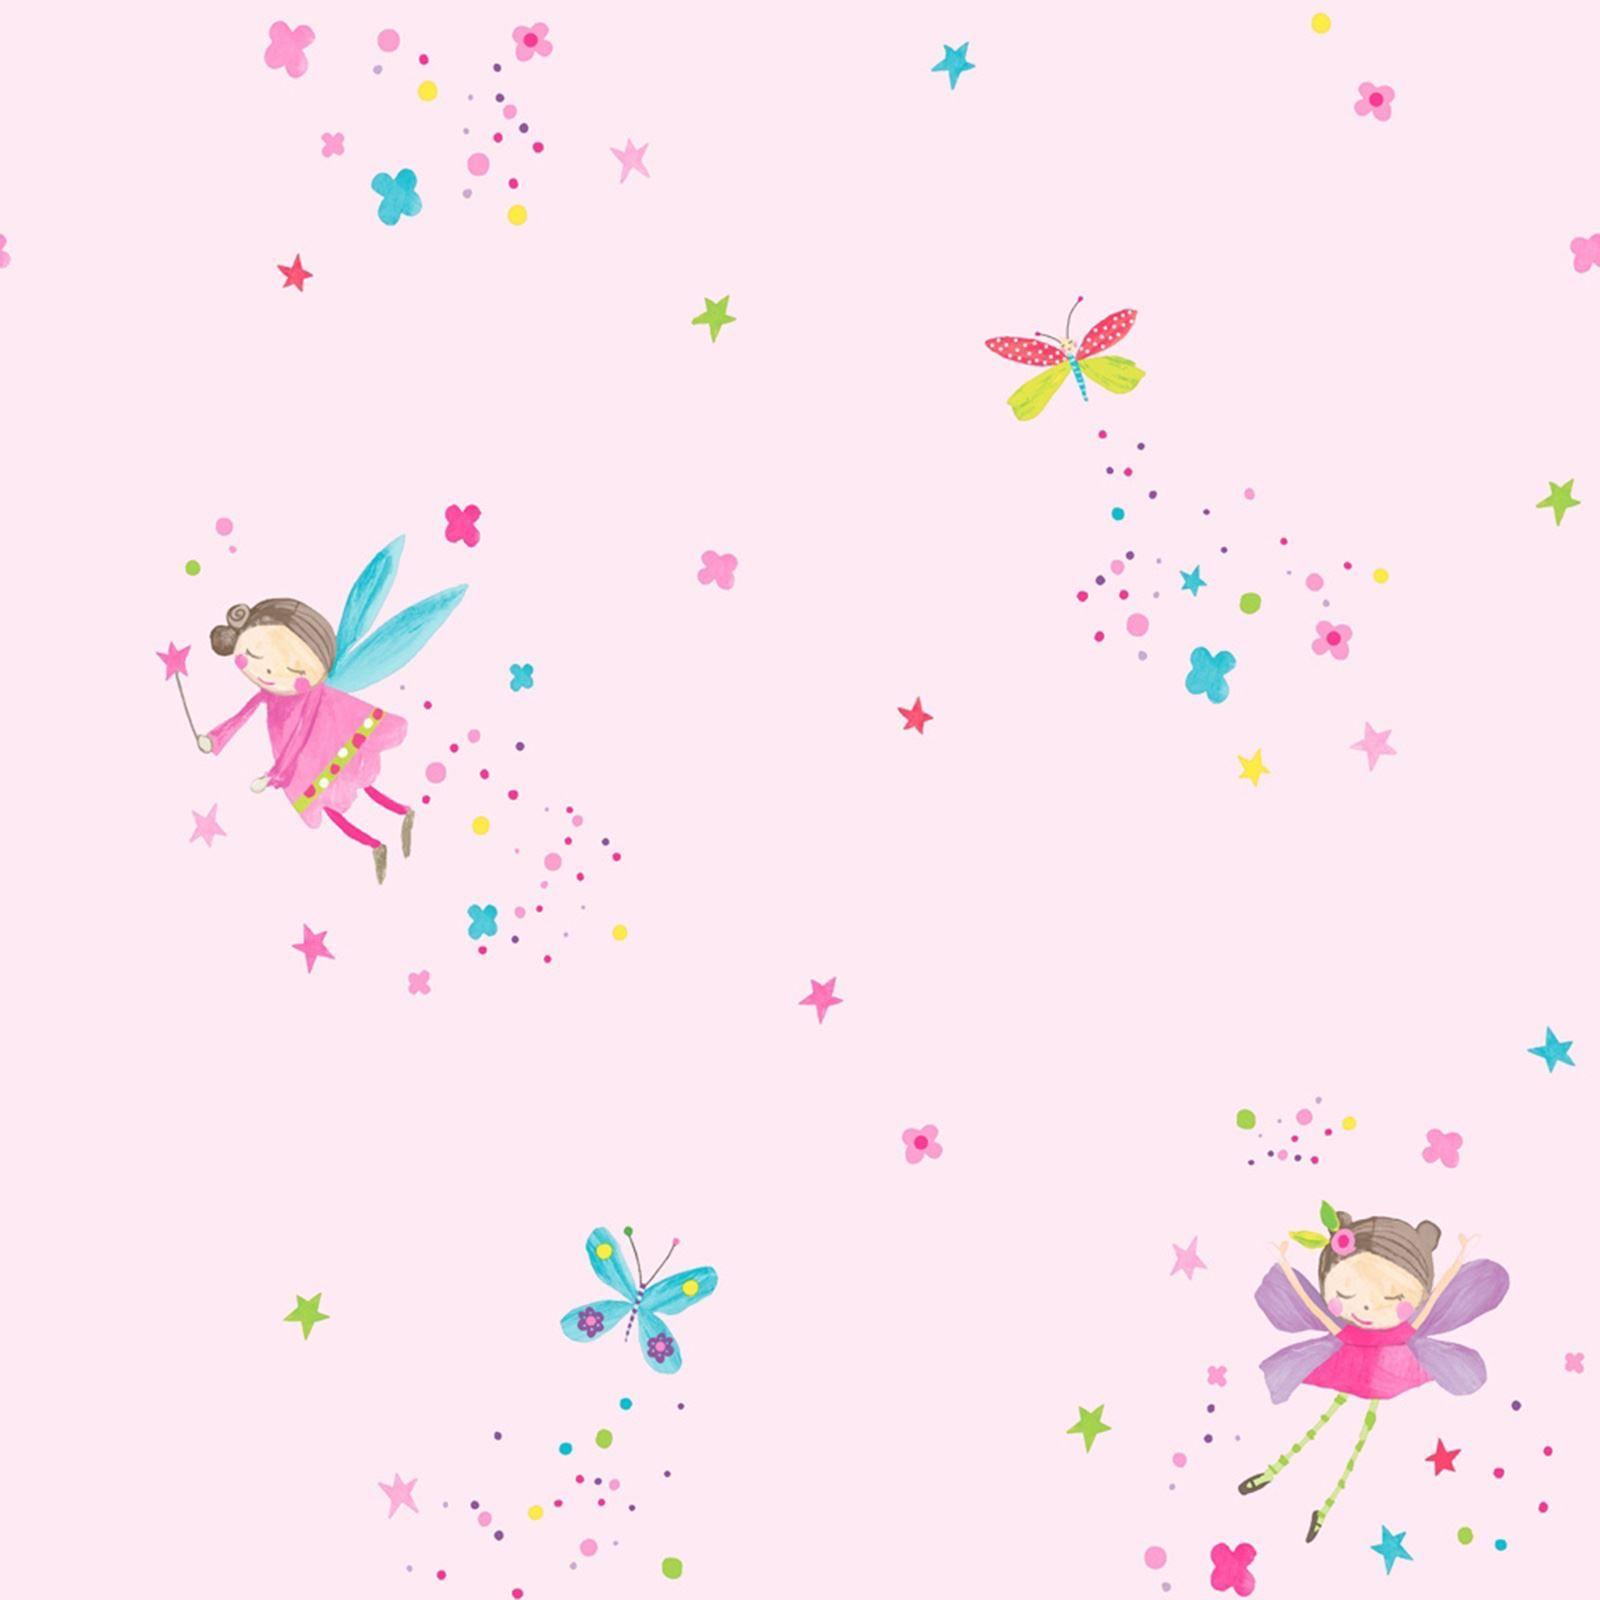 Mermaid For Kids Wallpapers Wallpaper Cave